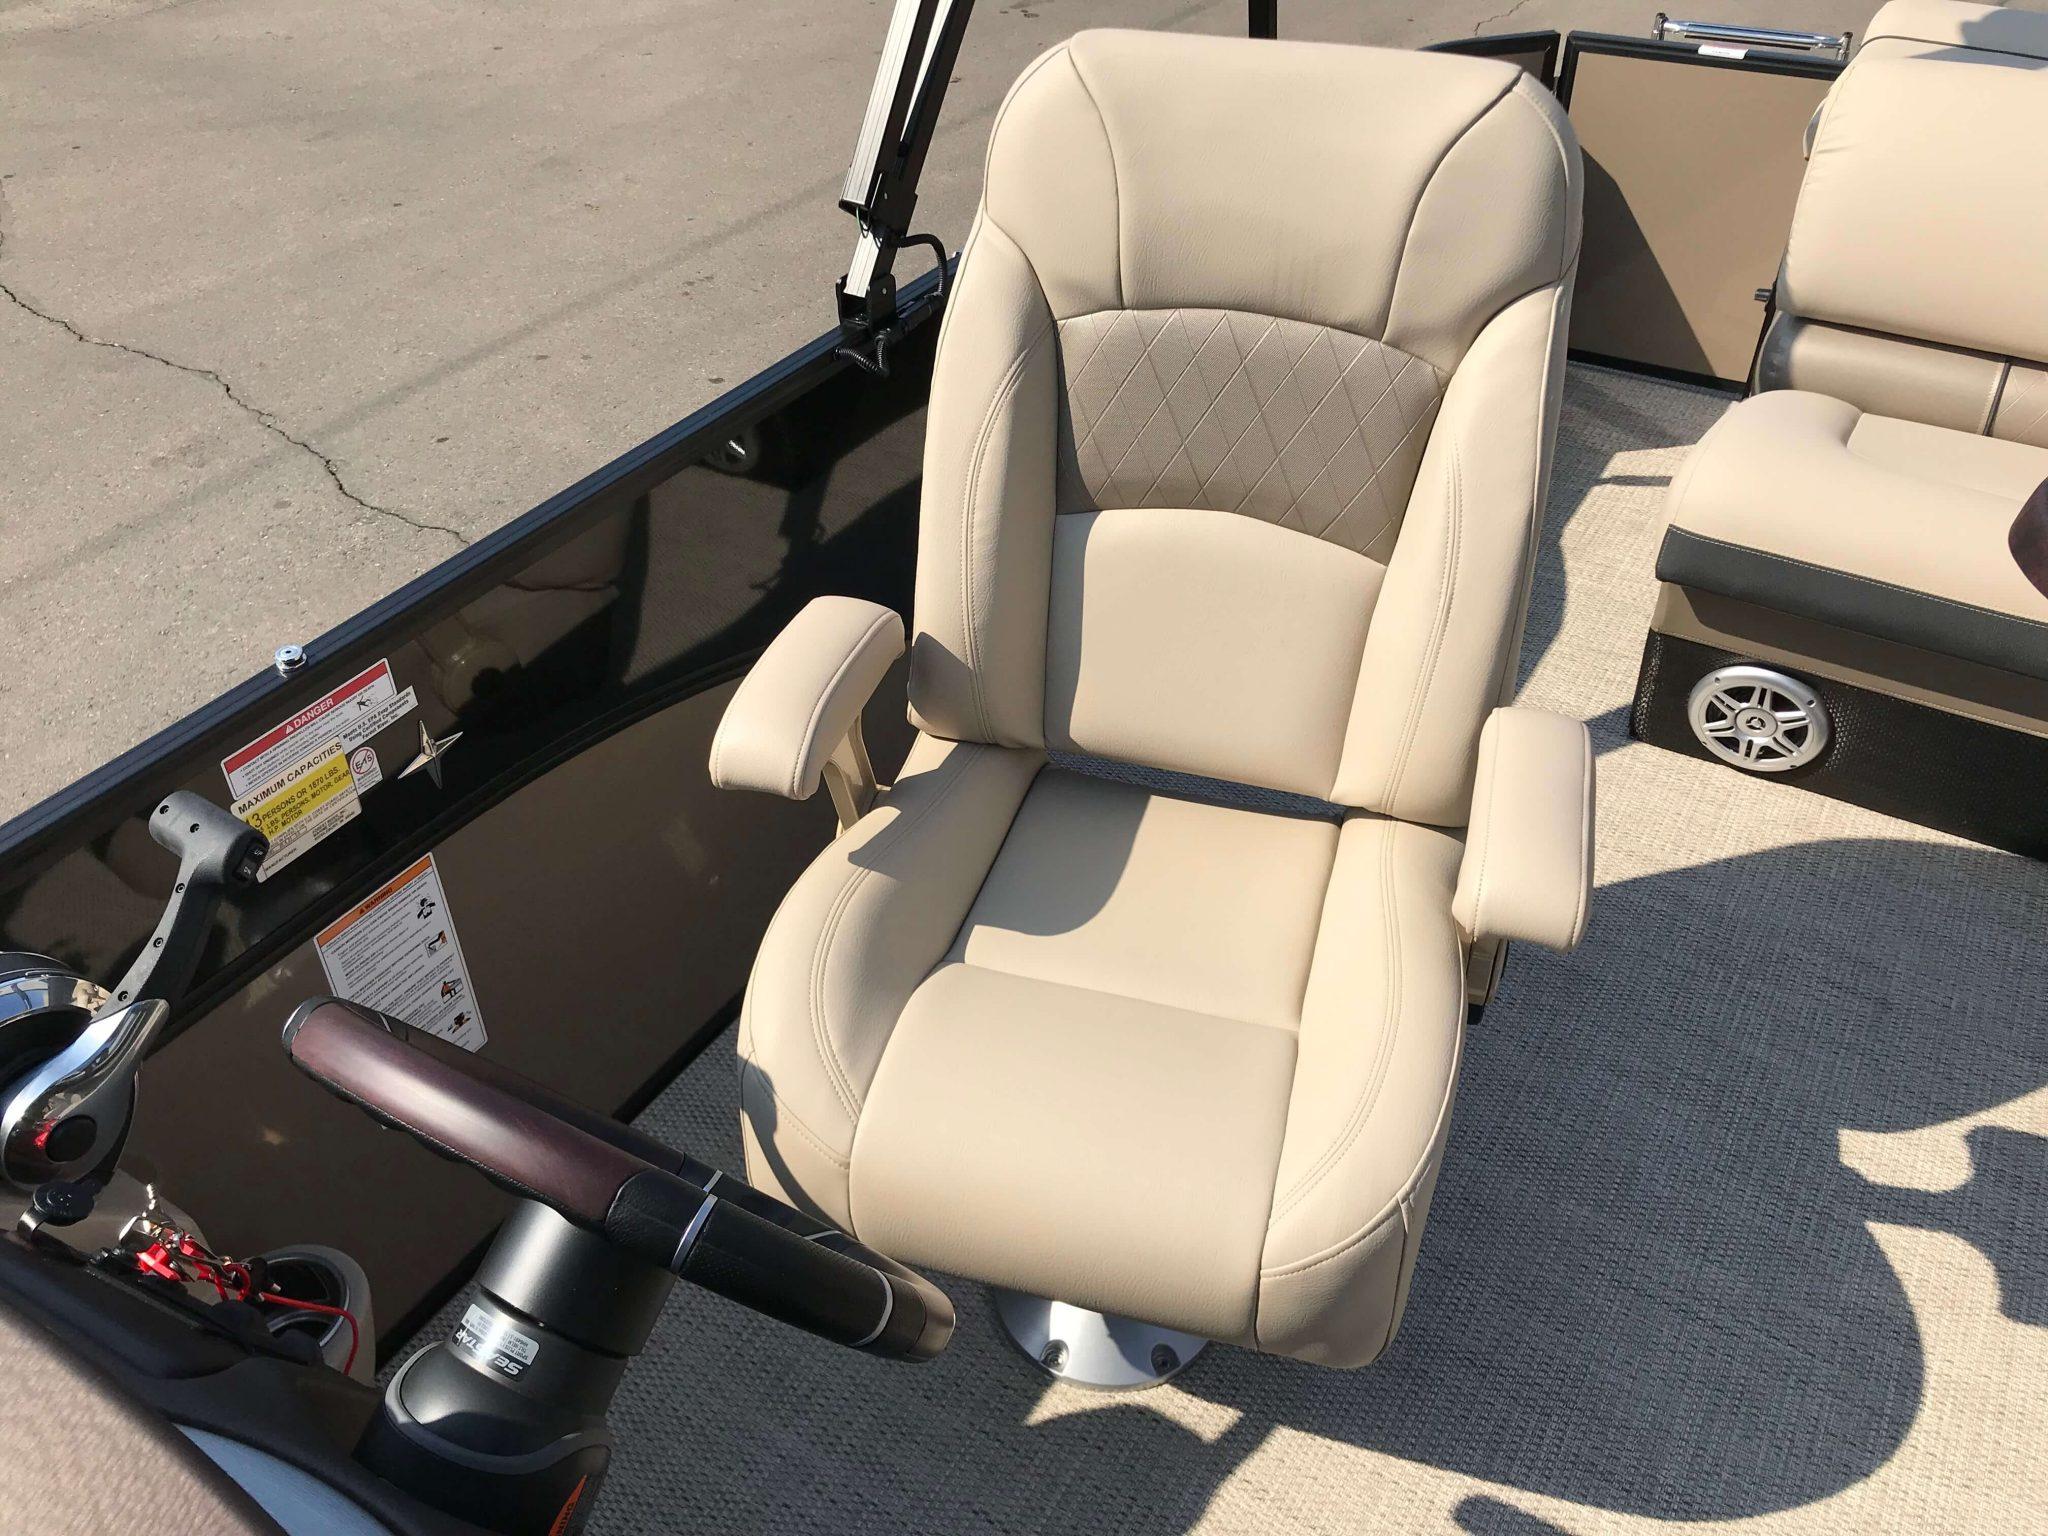 2019 Berkshire 23CL STS Captains Helm Chair